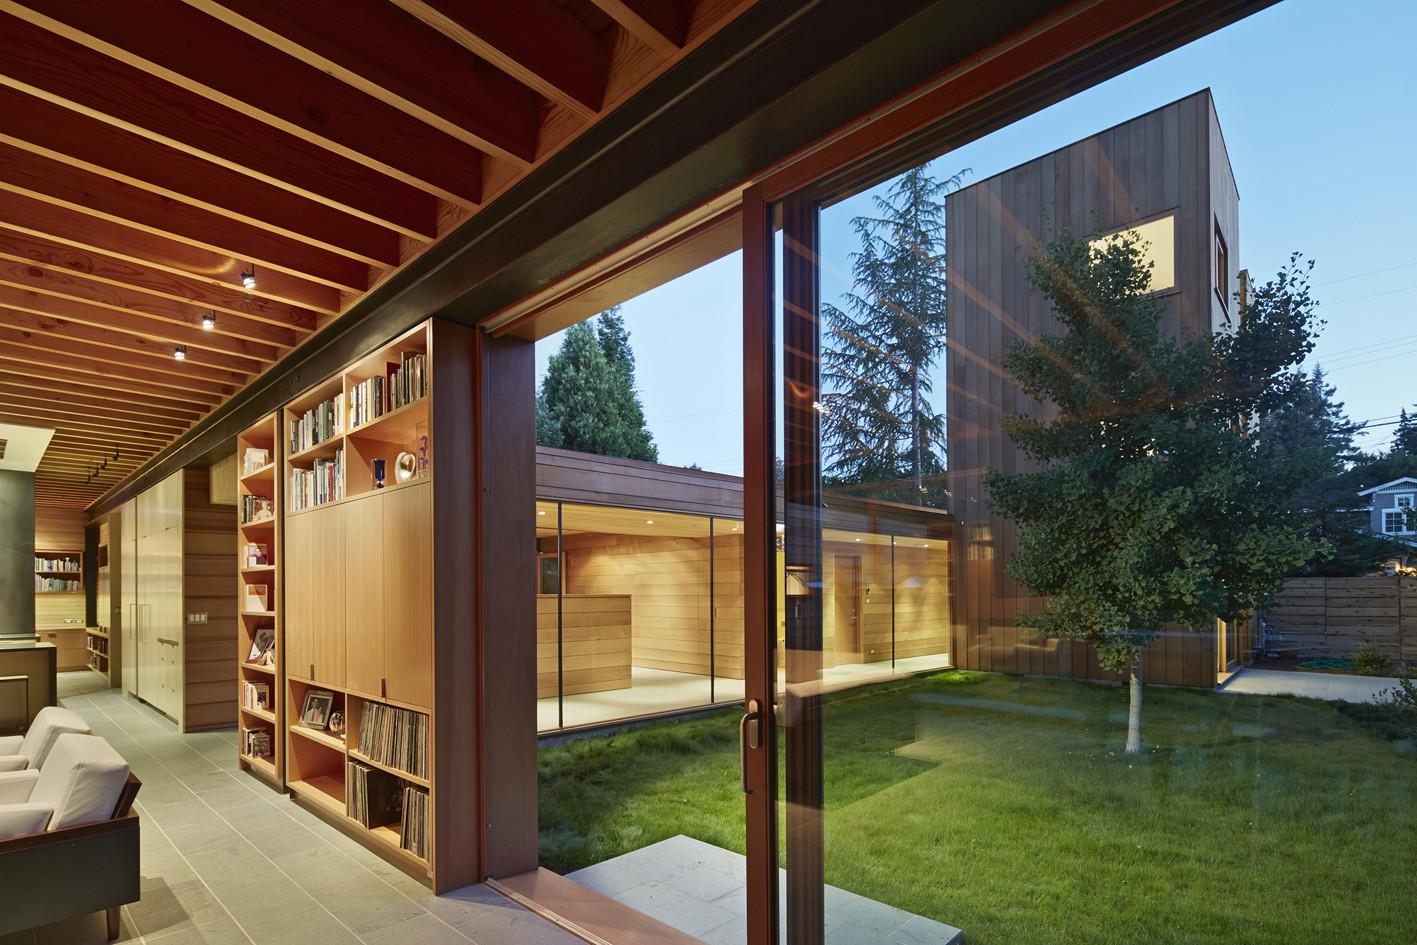 Low/Rise House / Spiegel Aihara Workshop, © Bruce Damonte